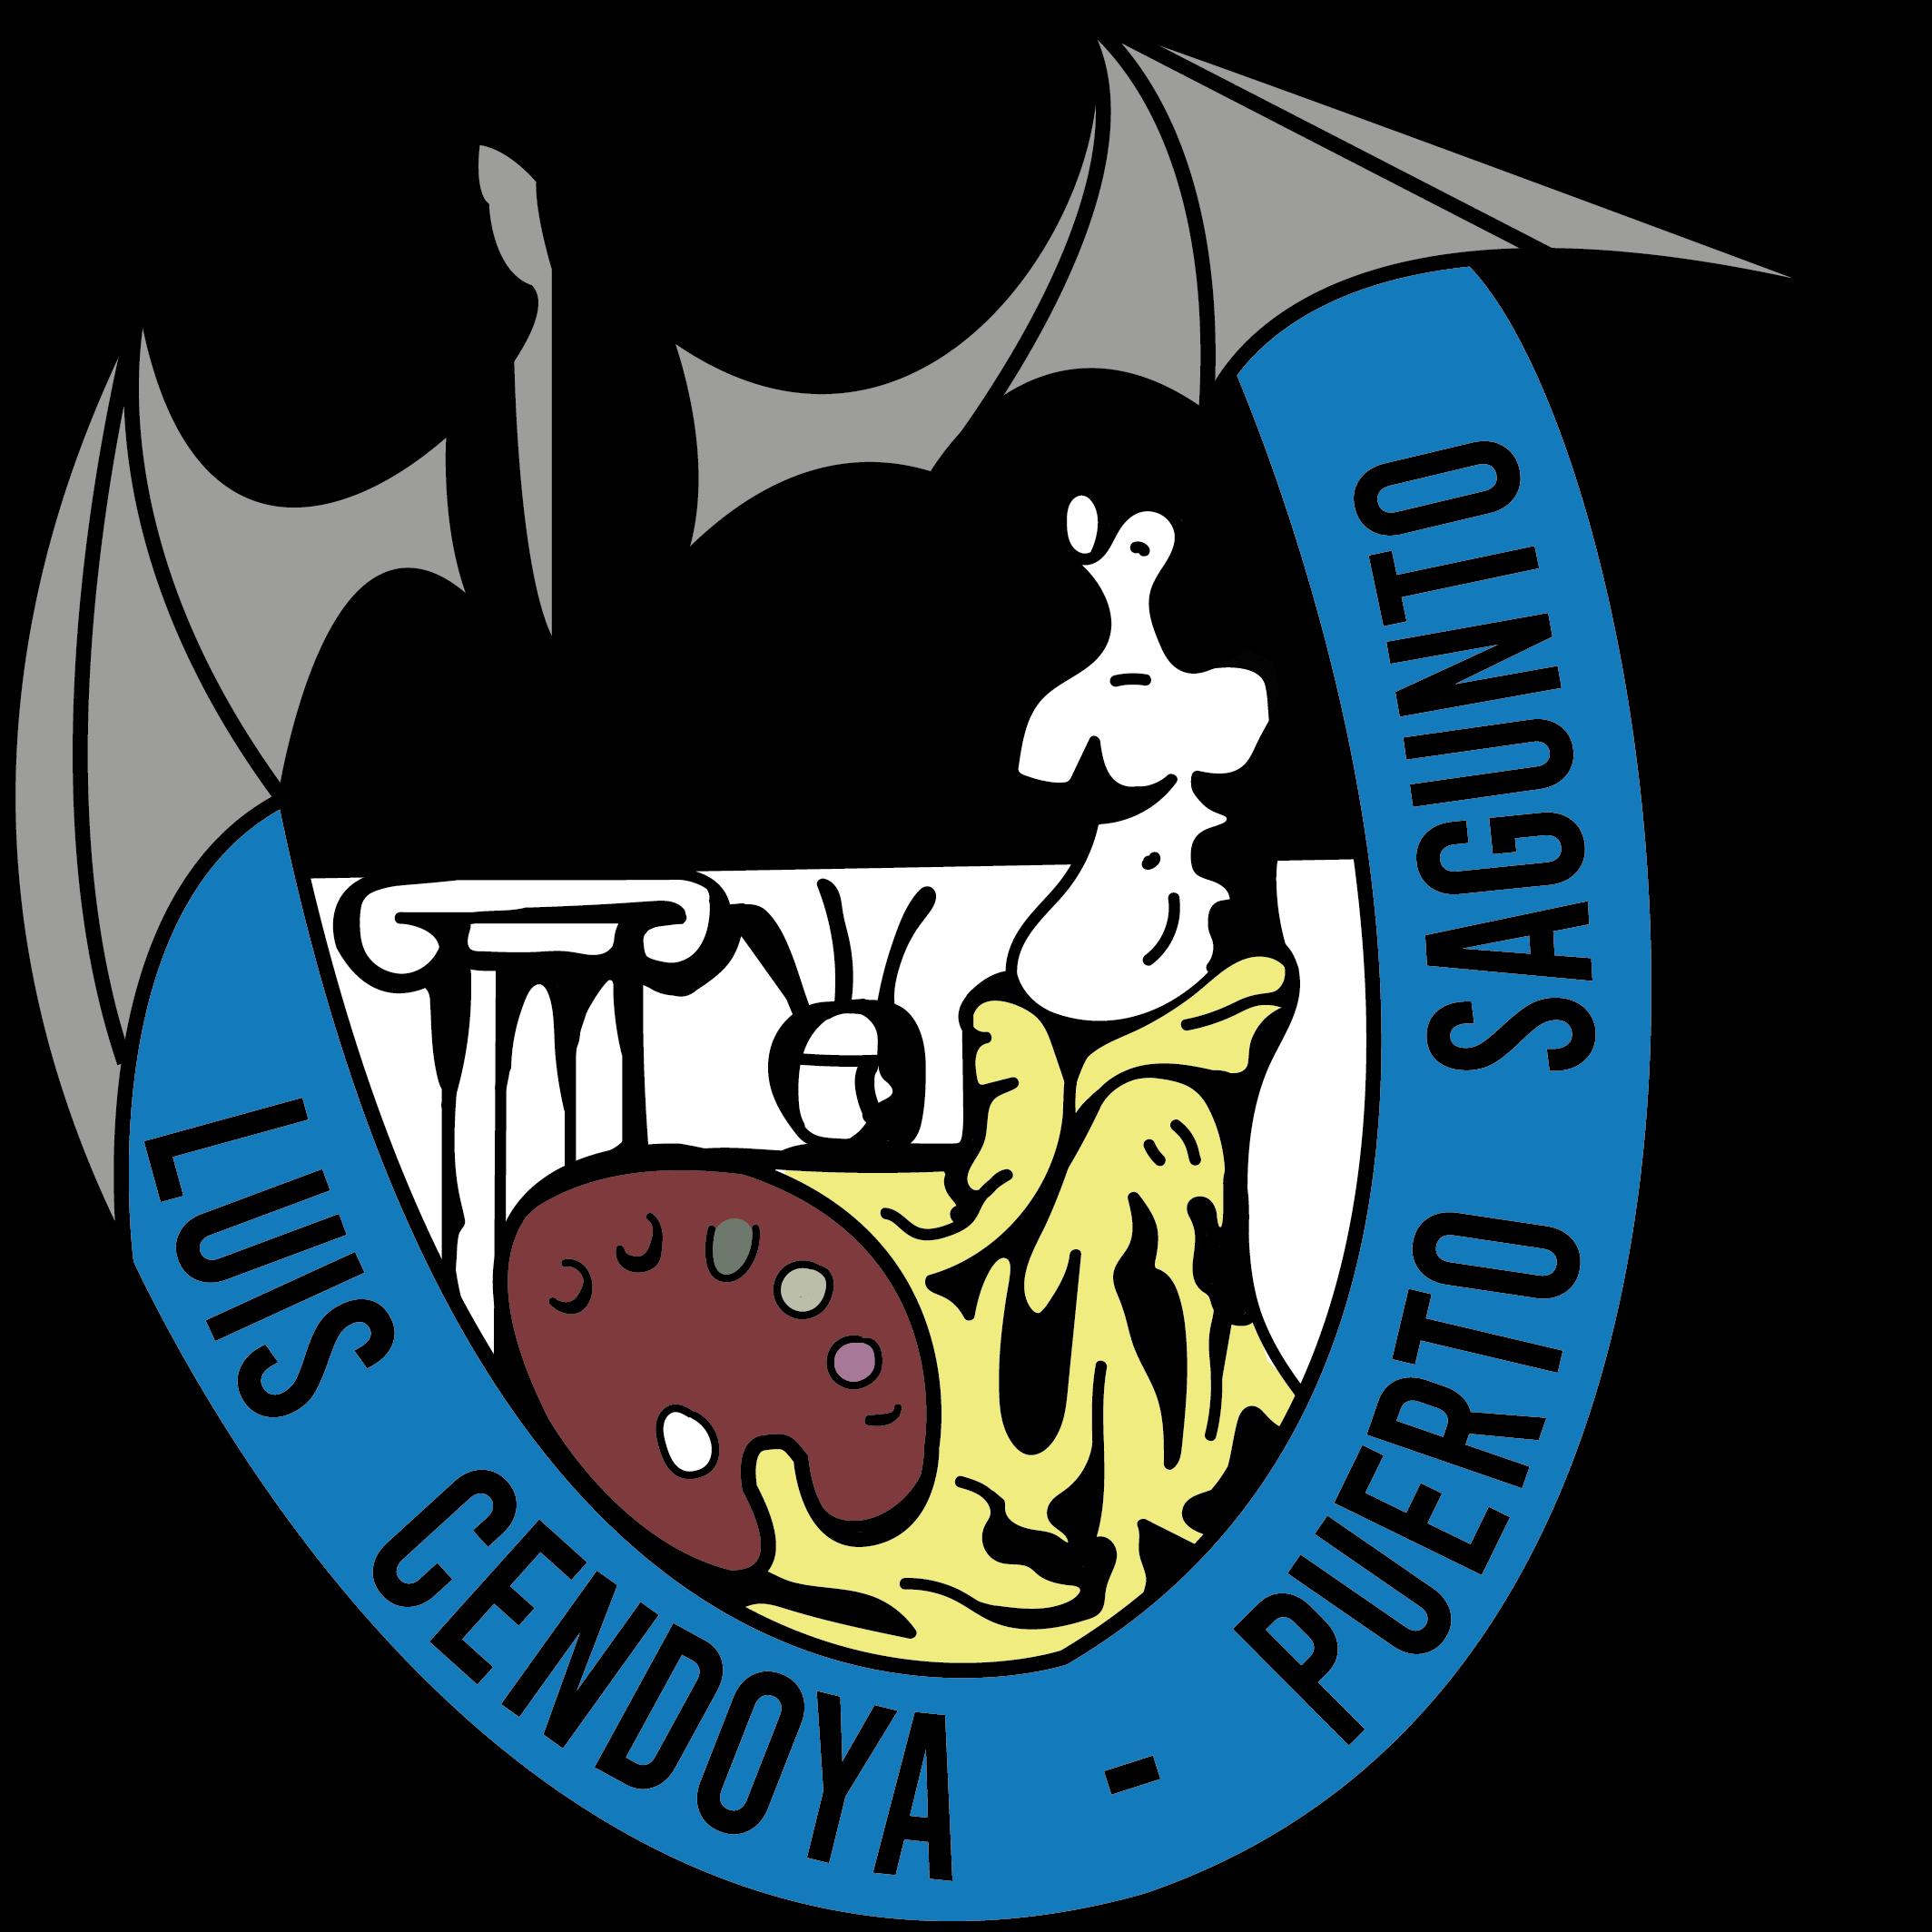 Falla Luis Cendoya